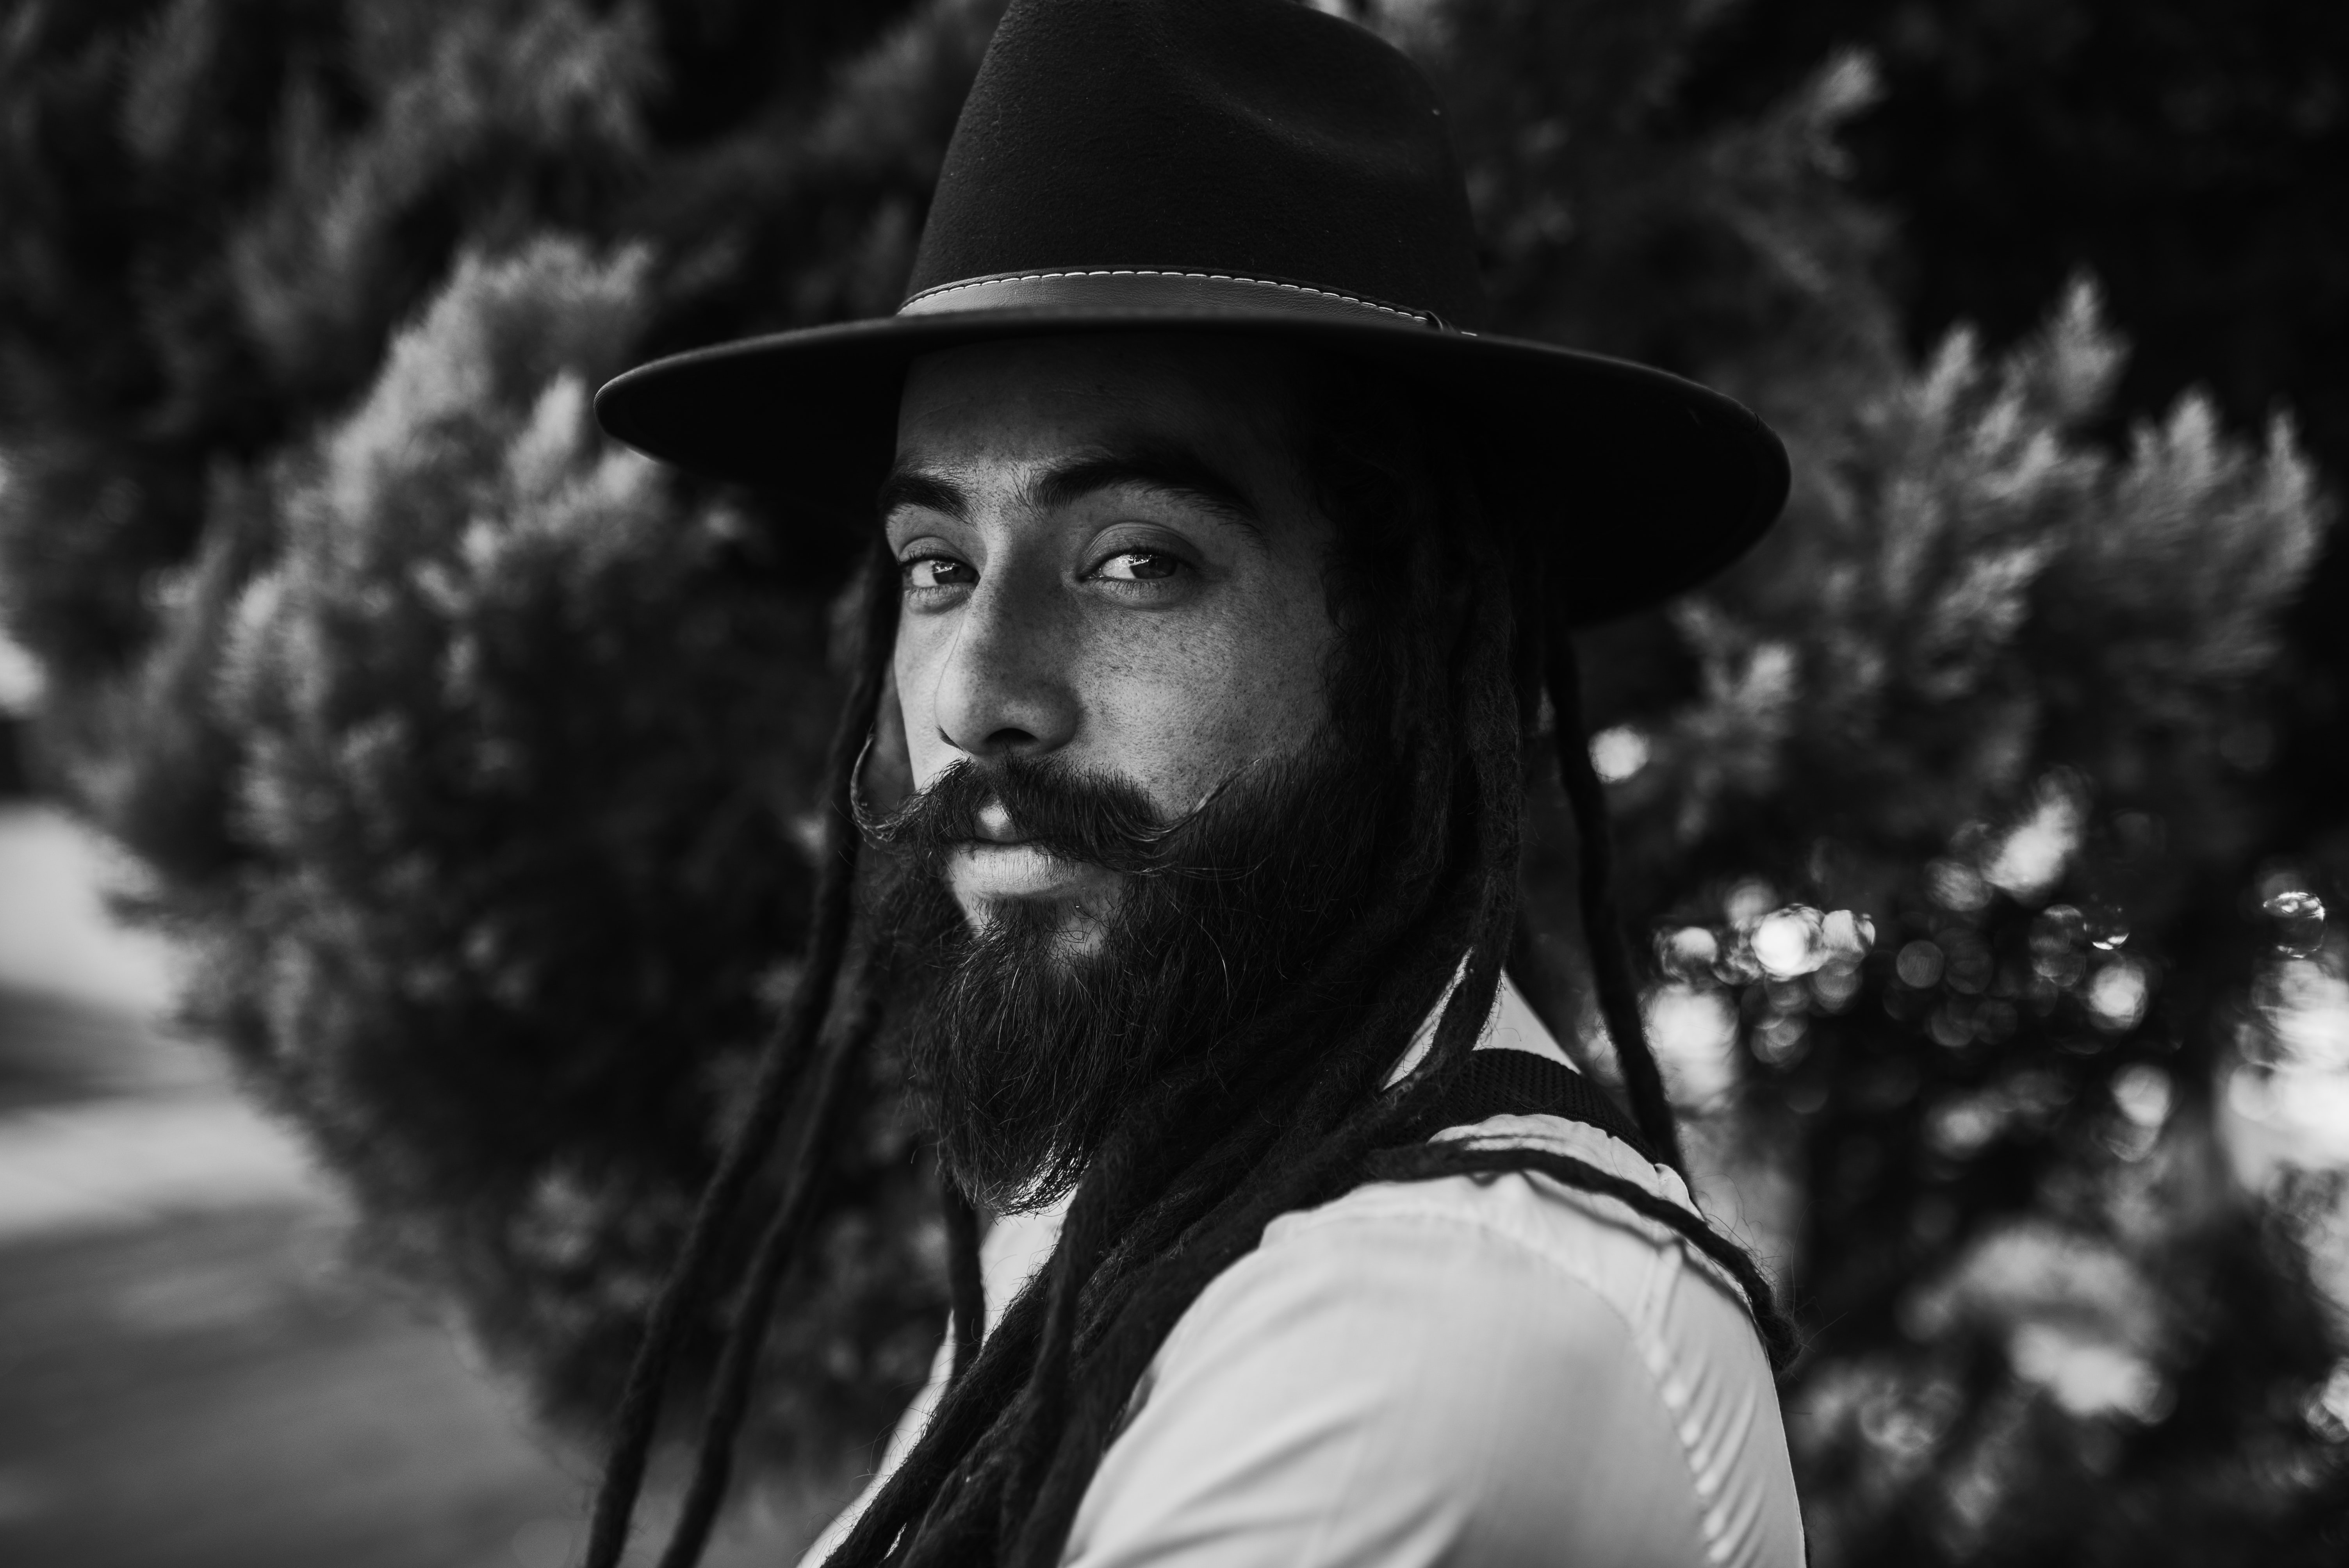 grayscale photo of man wearing black cap